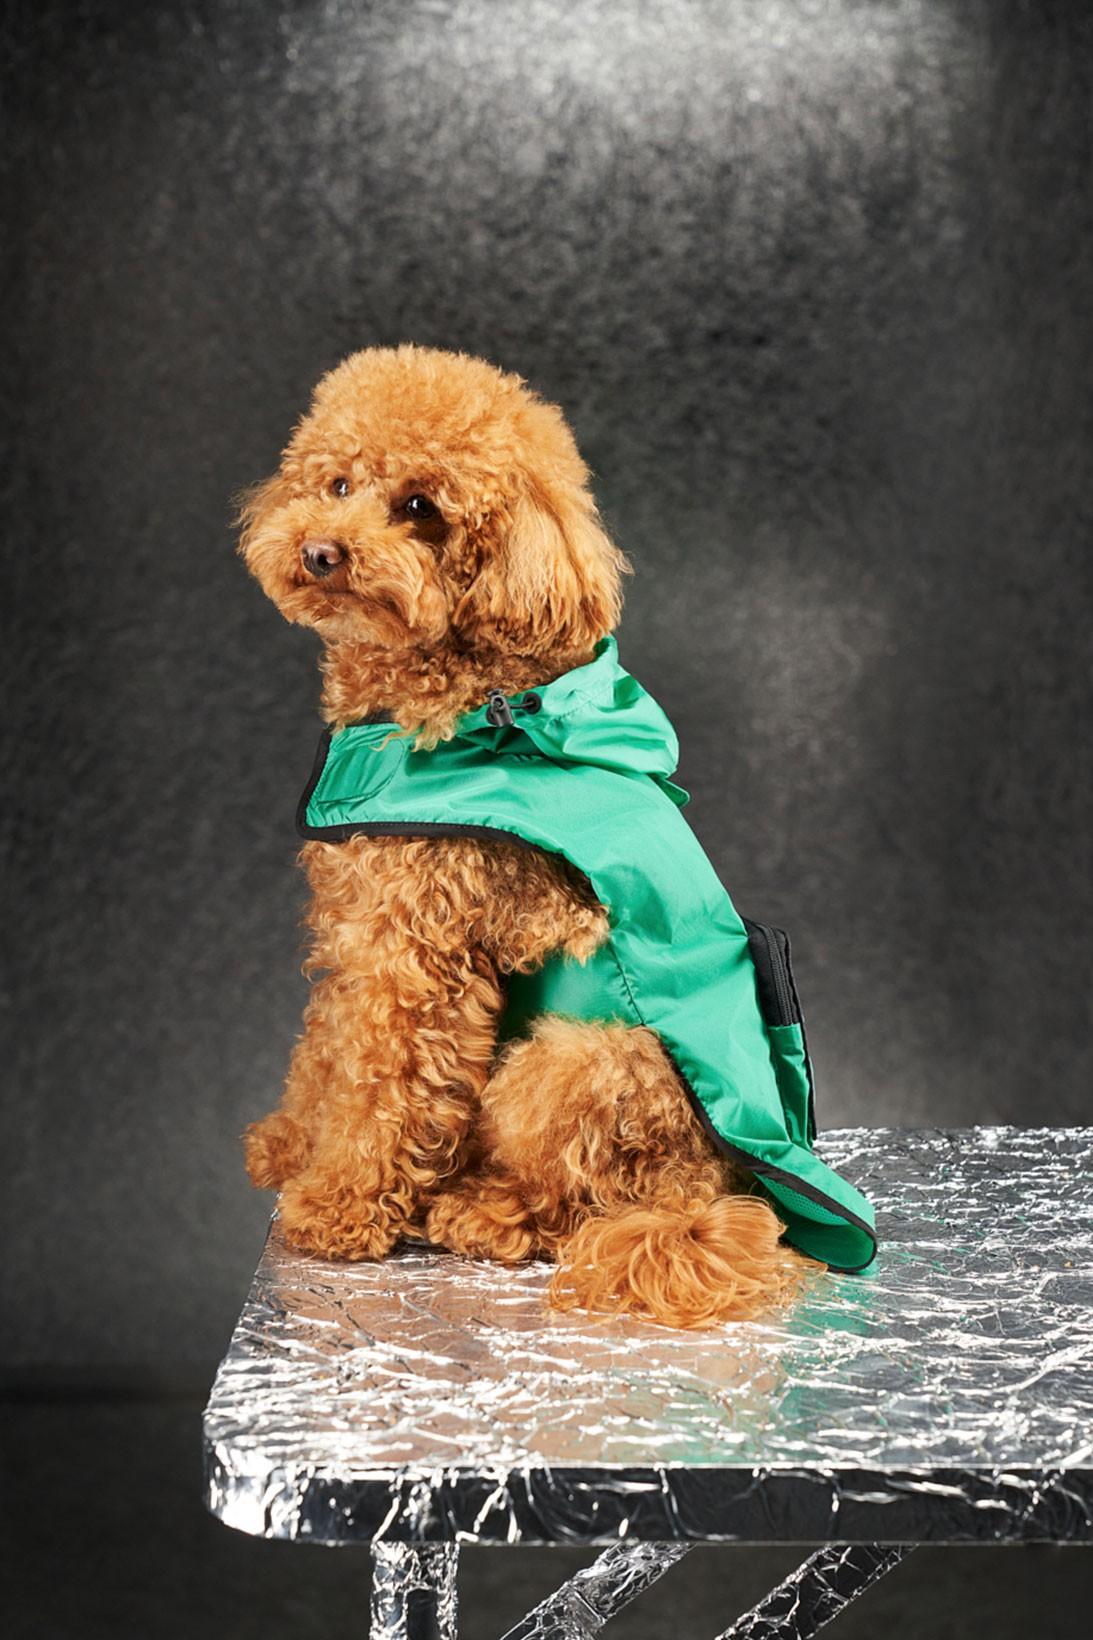 https___hypebeast.com_wp-content_blogs.dir_6_files_2020_11_moncler-genius-poldo-dog-couture-petwear-3